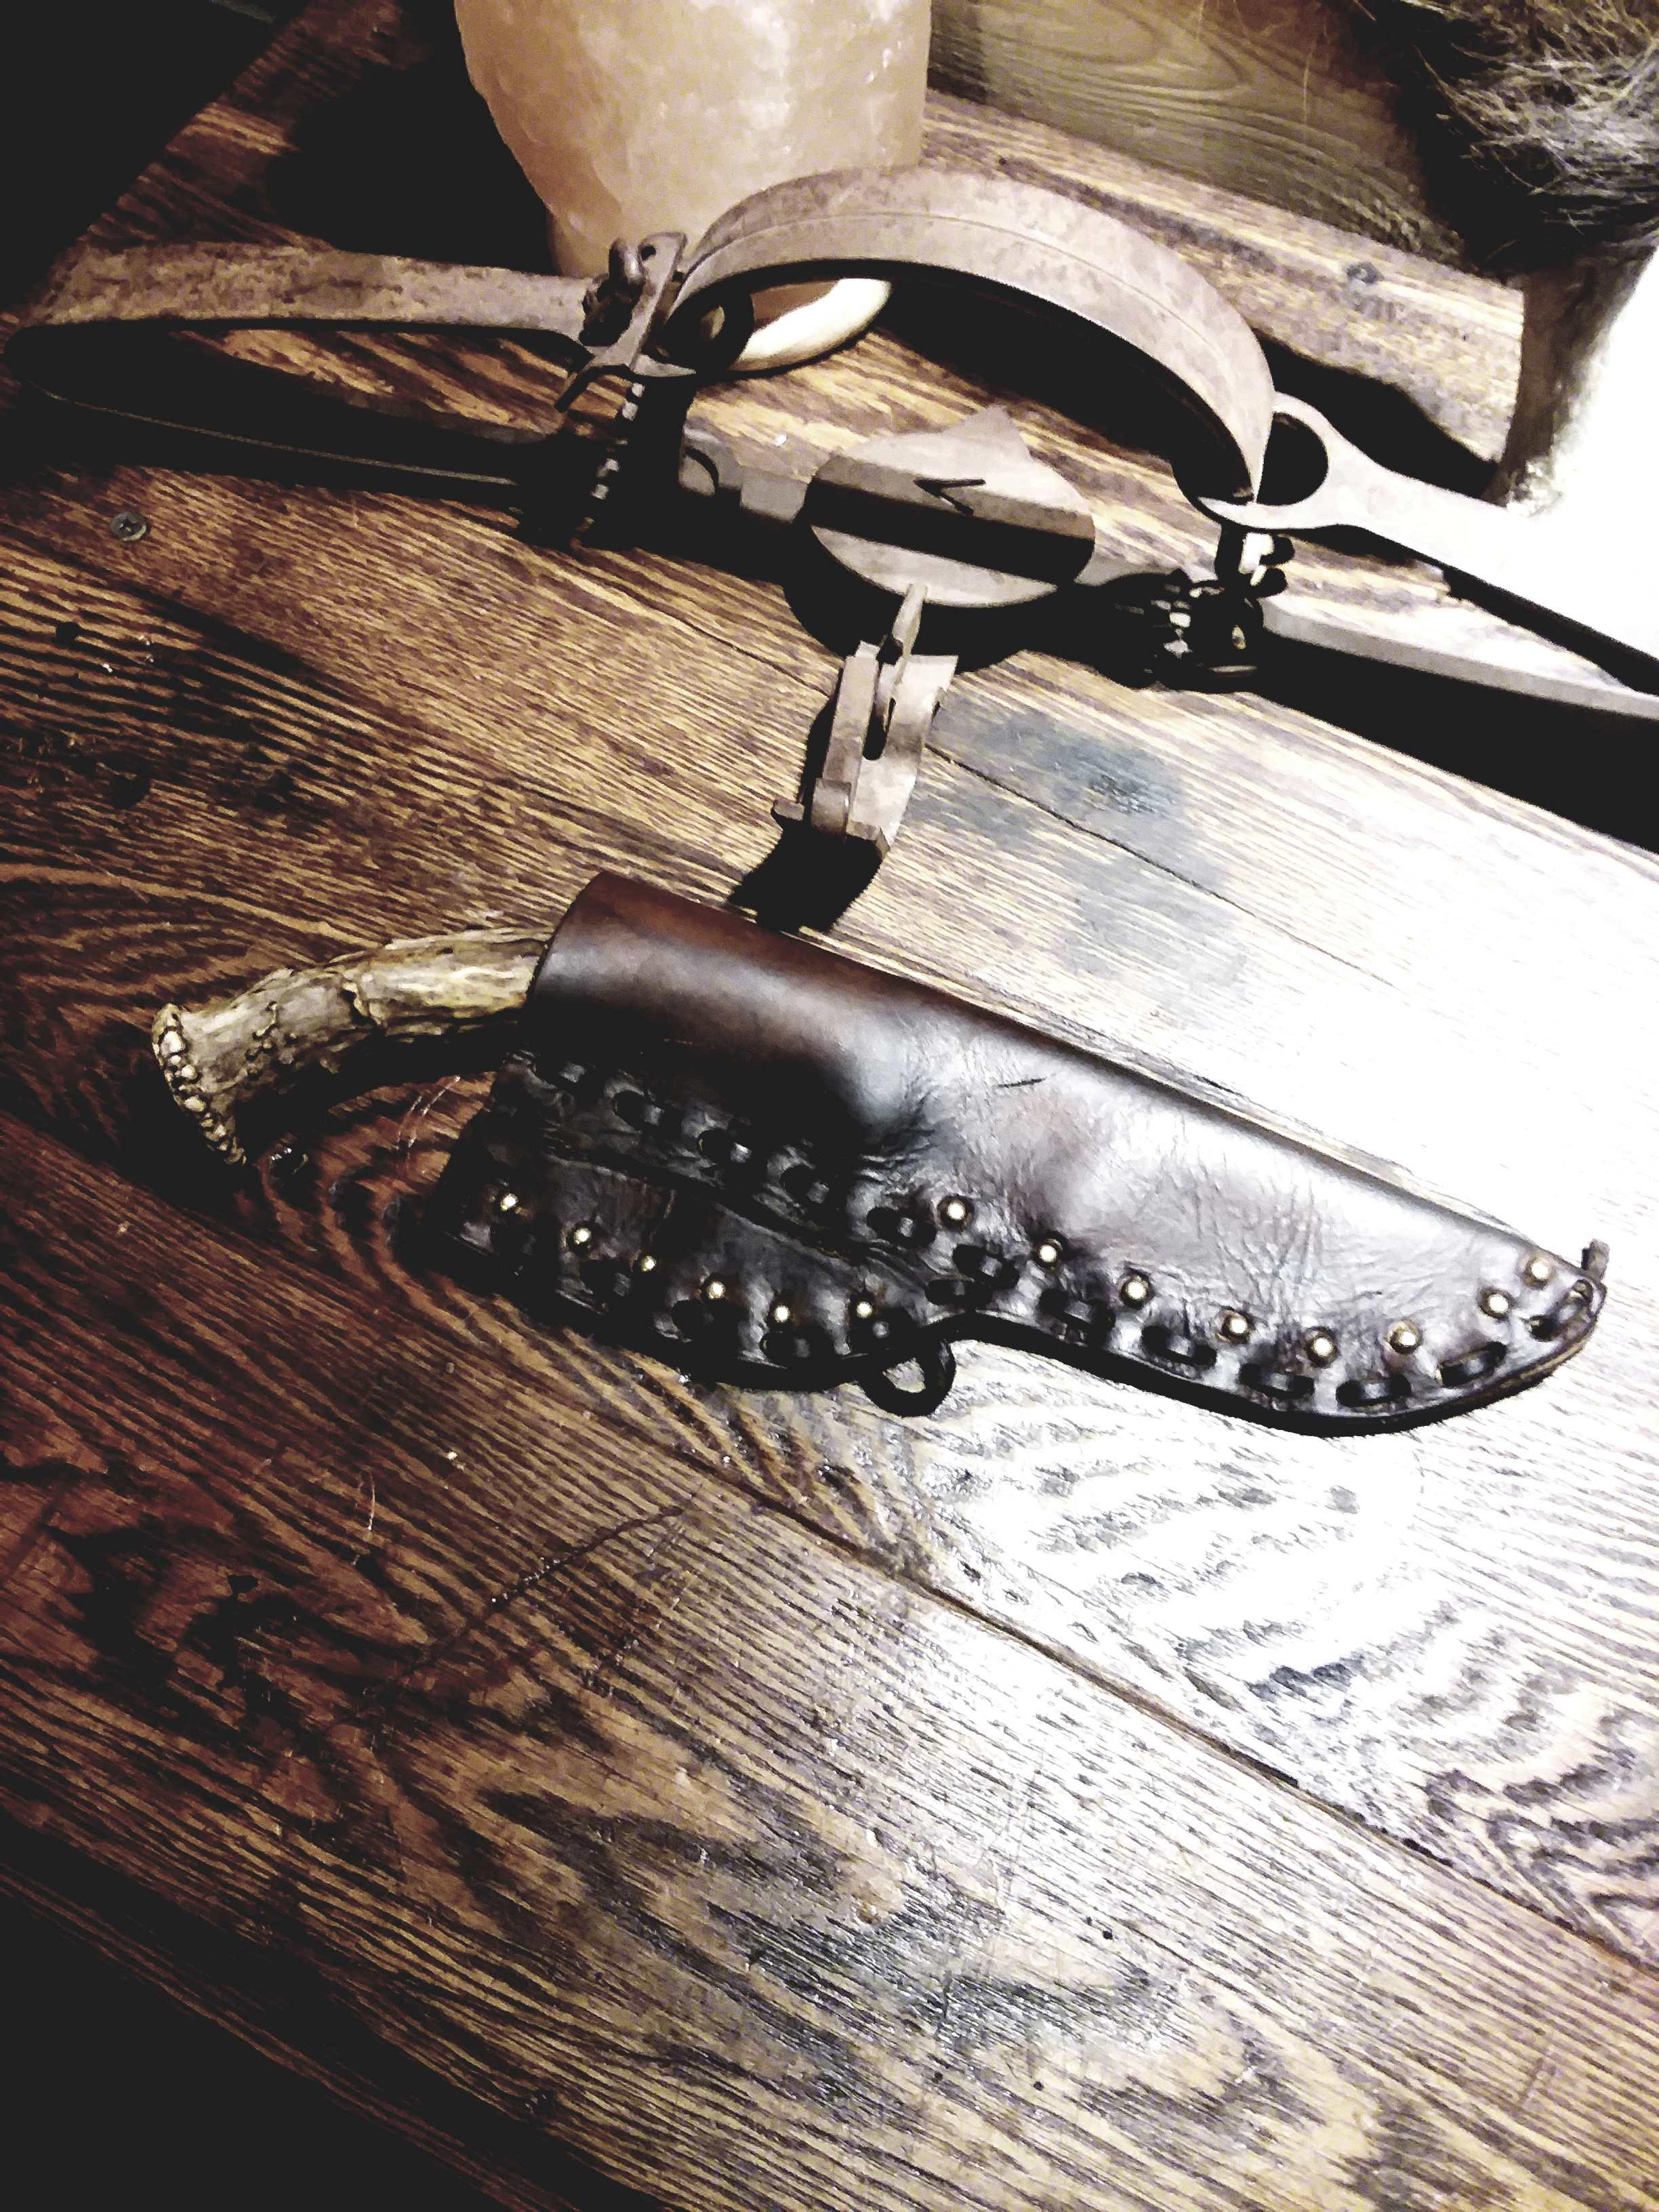 Updating my knife sheath 20190413